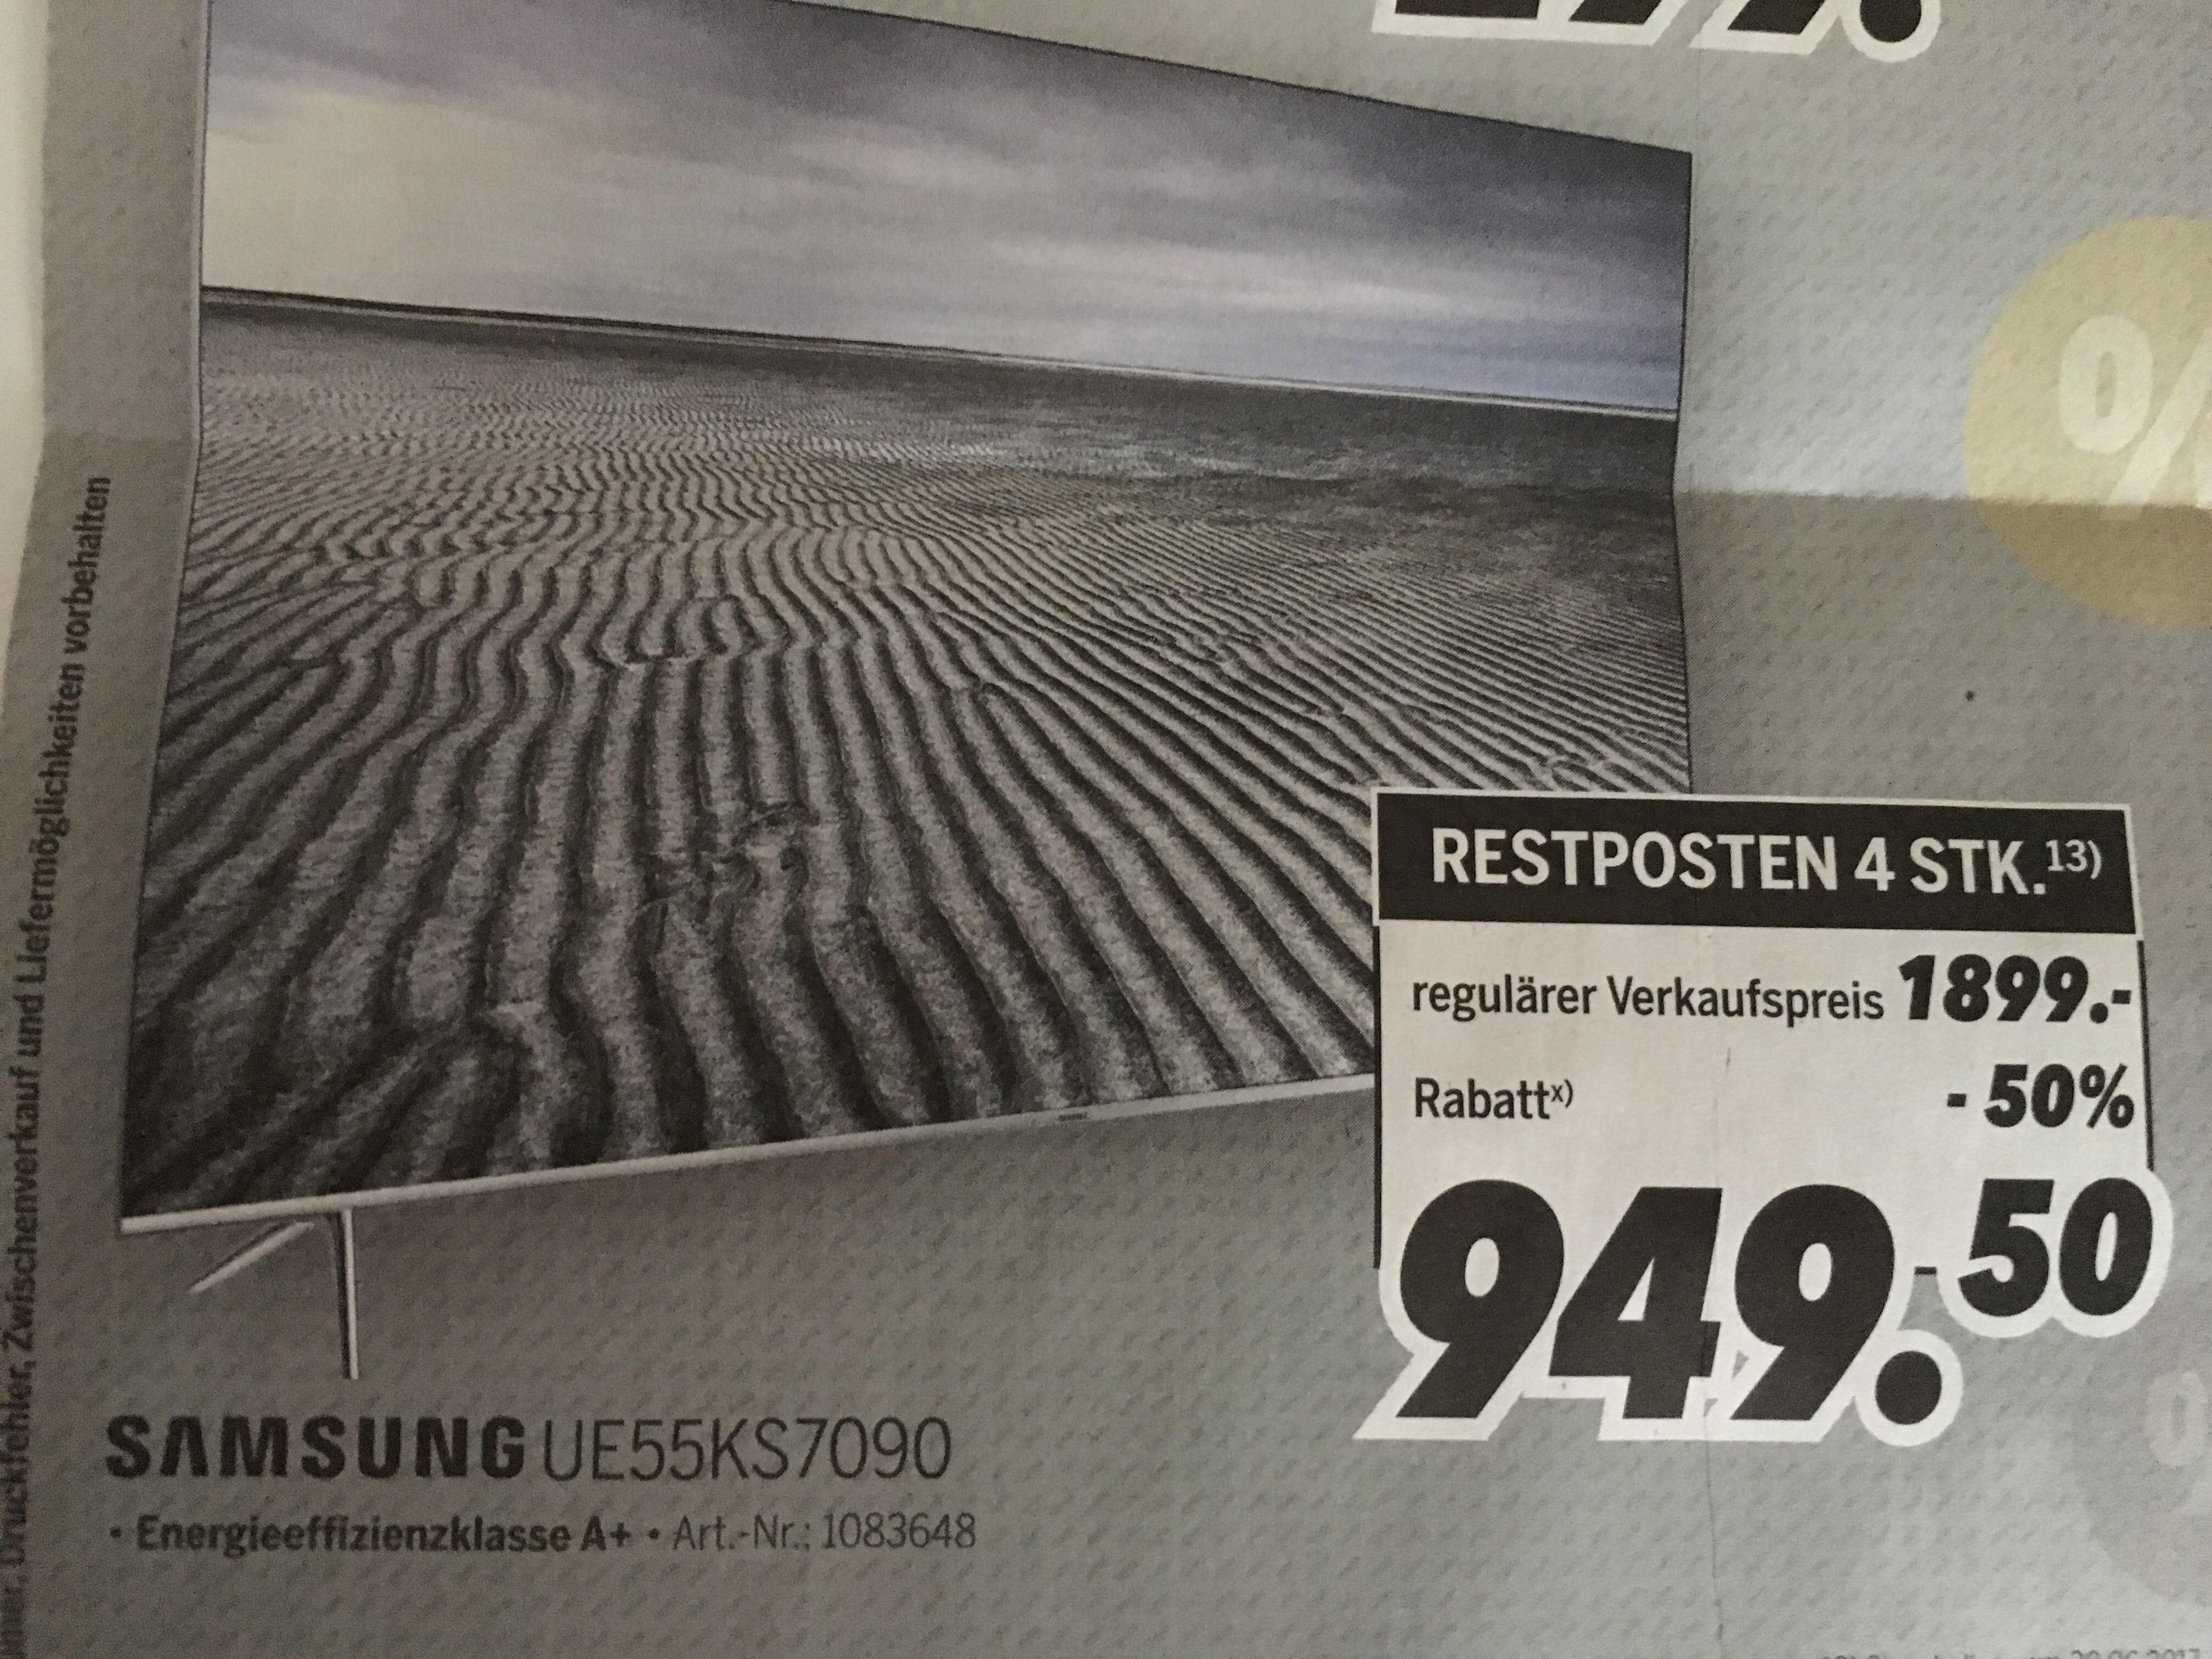 [Medimax Hannover/Hildesheim] Samsung 55KS7090, 100Hz, 4k HDR10, (nur 4 Stk. verfügbar)